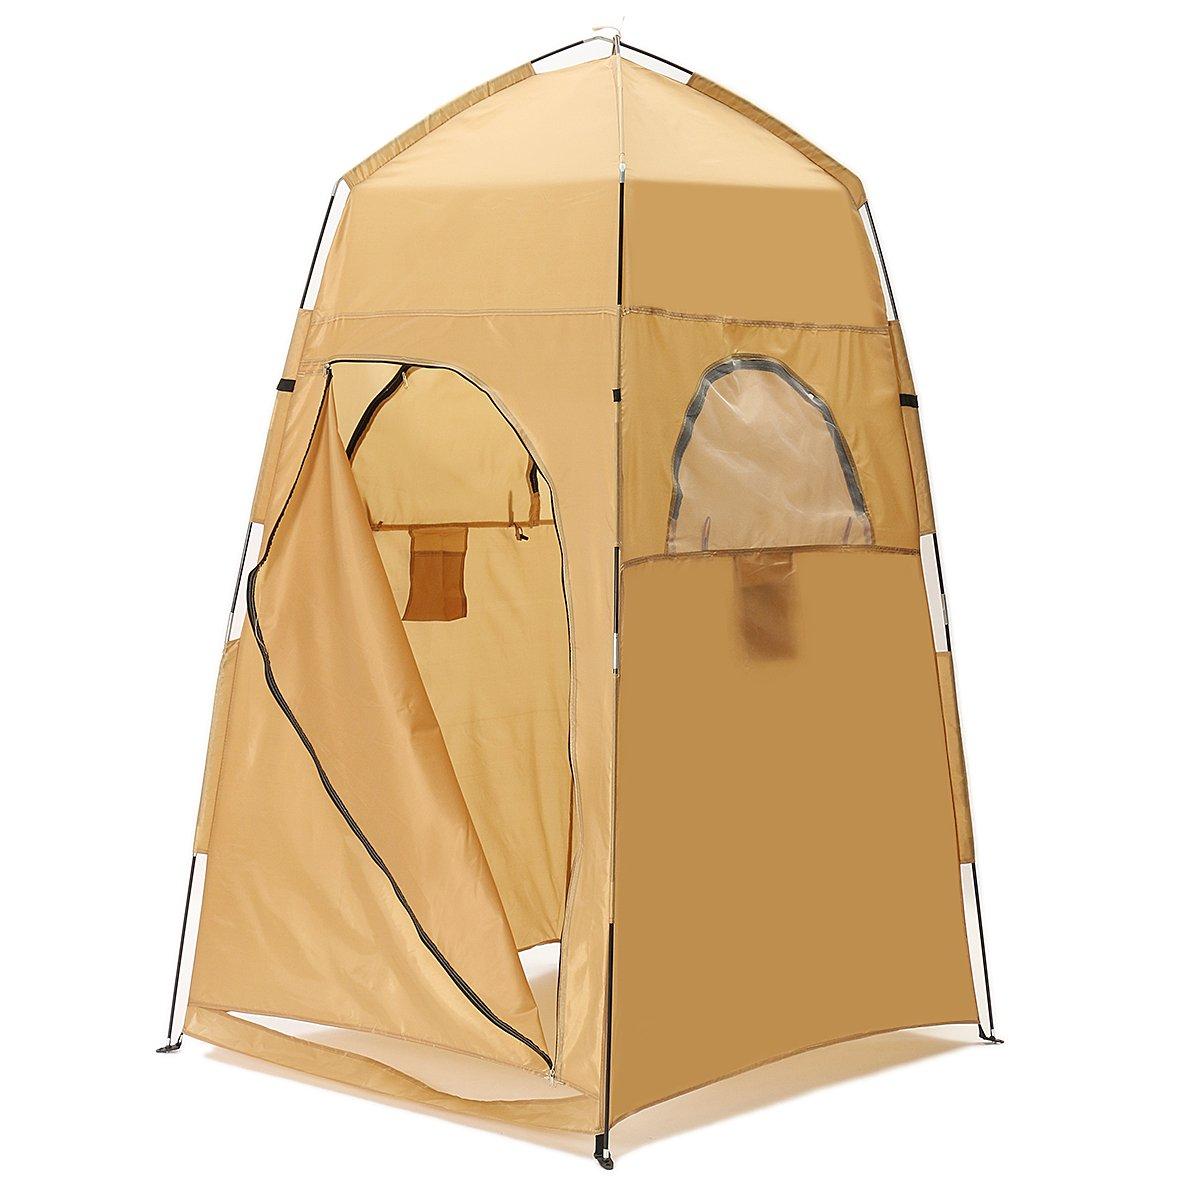 LaDicha Portable Pop-Up Camping Dusche Badezimmer Privatsphäre Toiletten Wechselzelt Outdoor Shelter